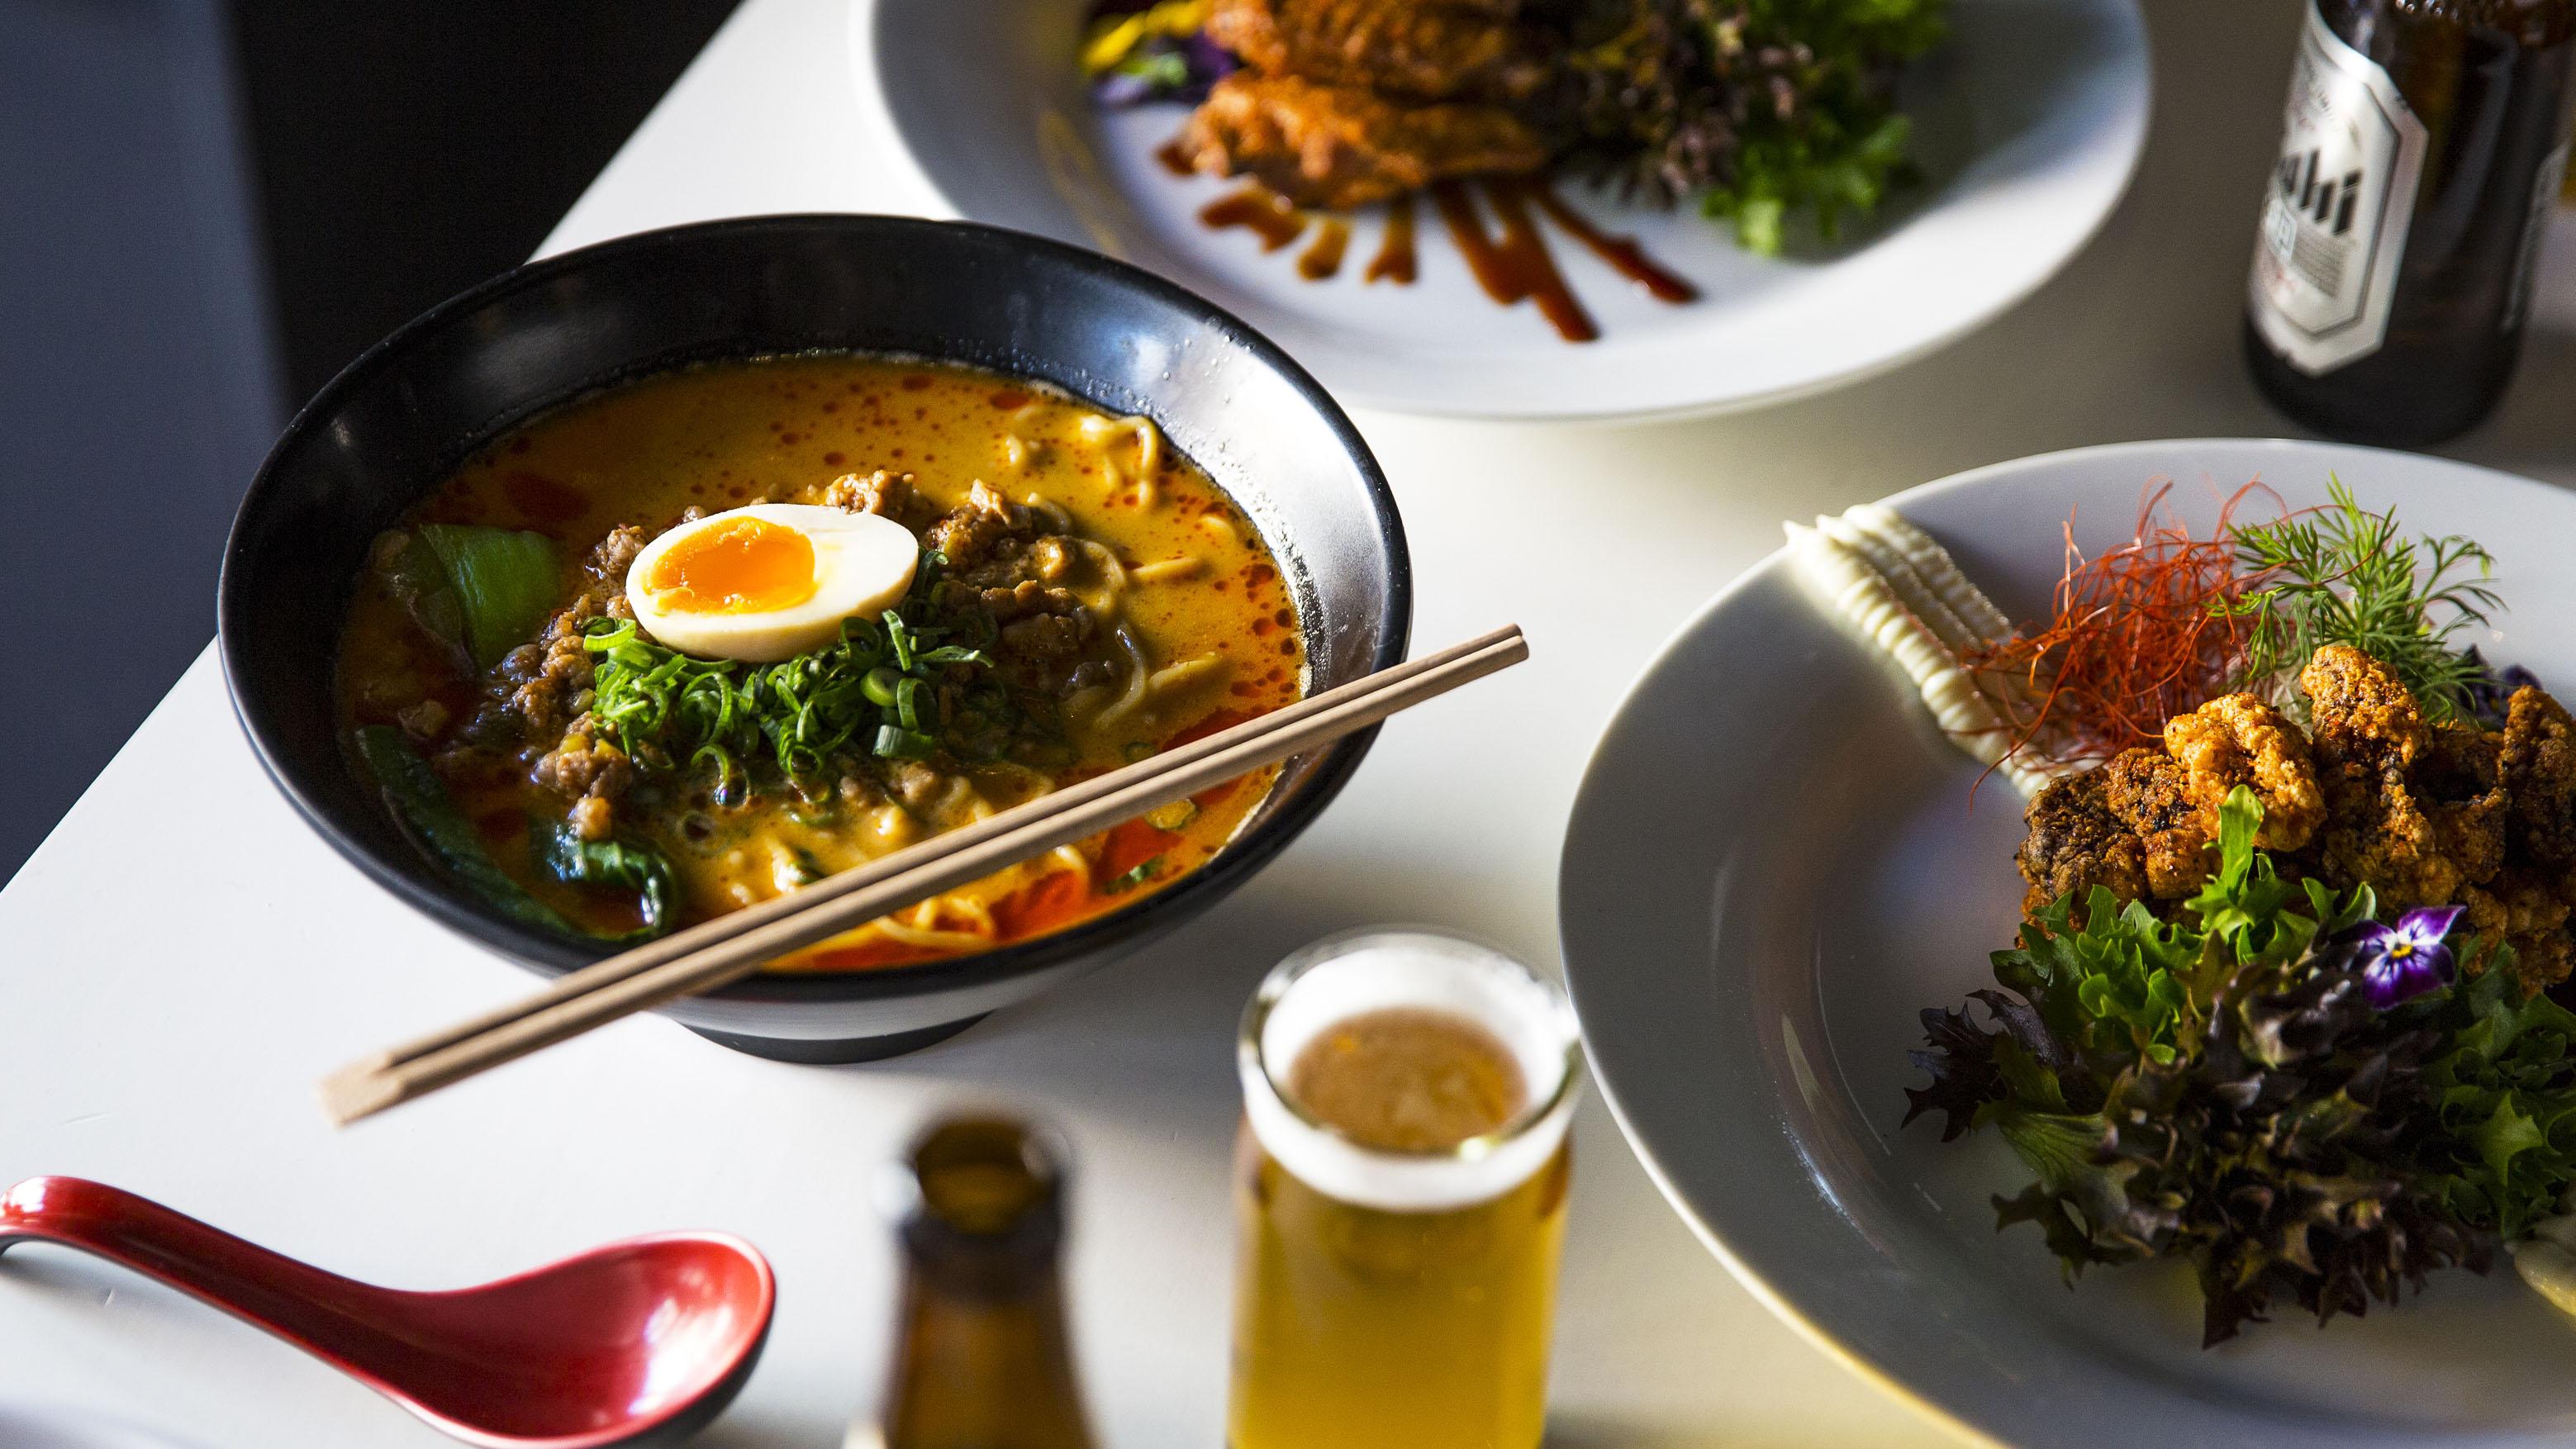 Shizuku Ramen, Japanese restaurant